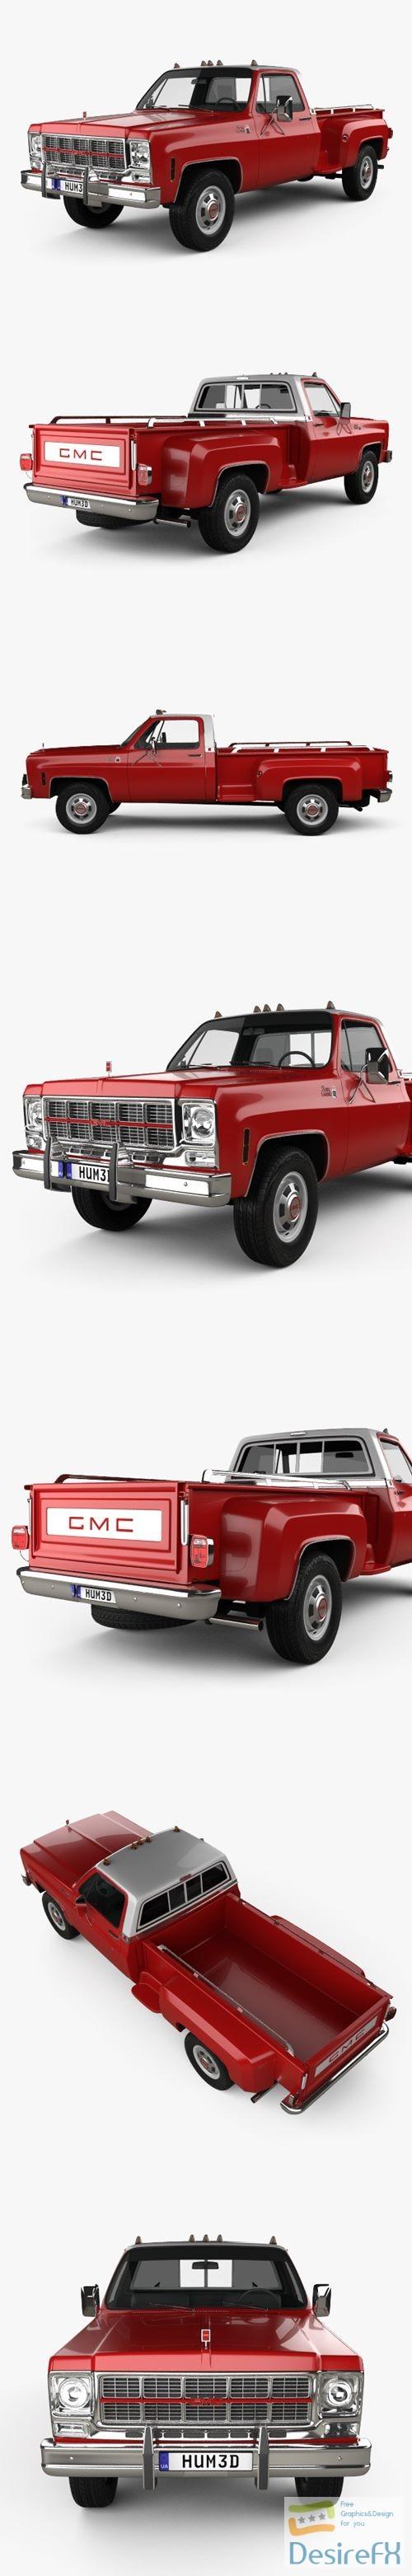 3d-models - GMC Sierra Grande 454 Pickup 1979 3D Model